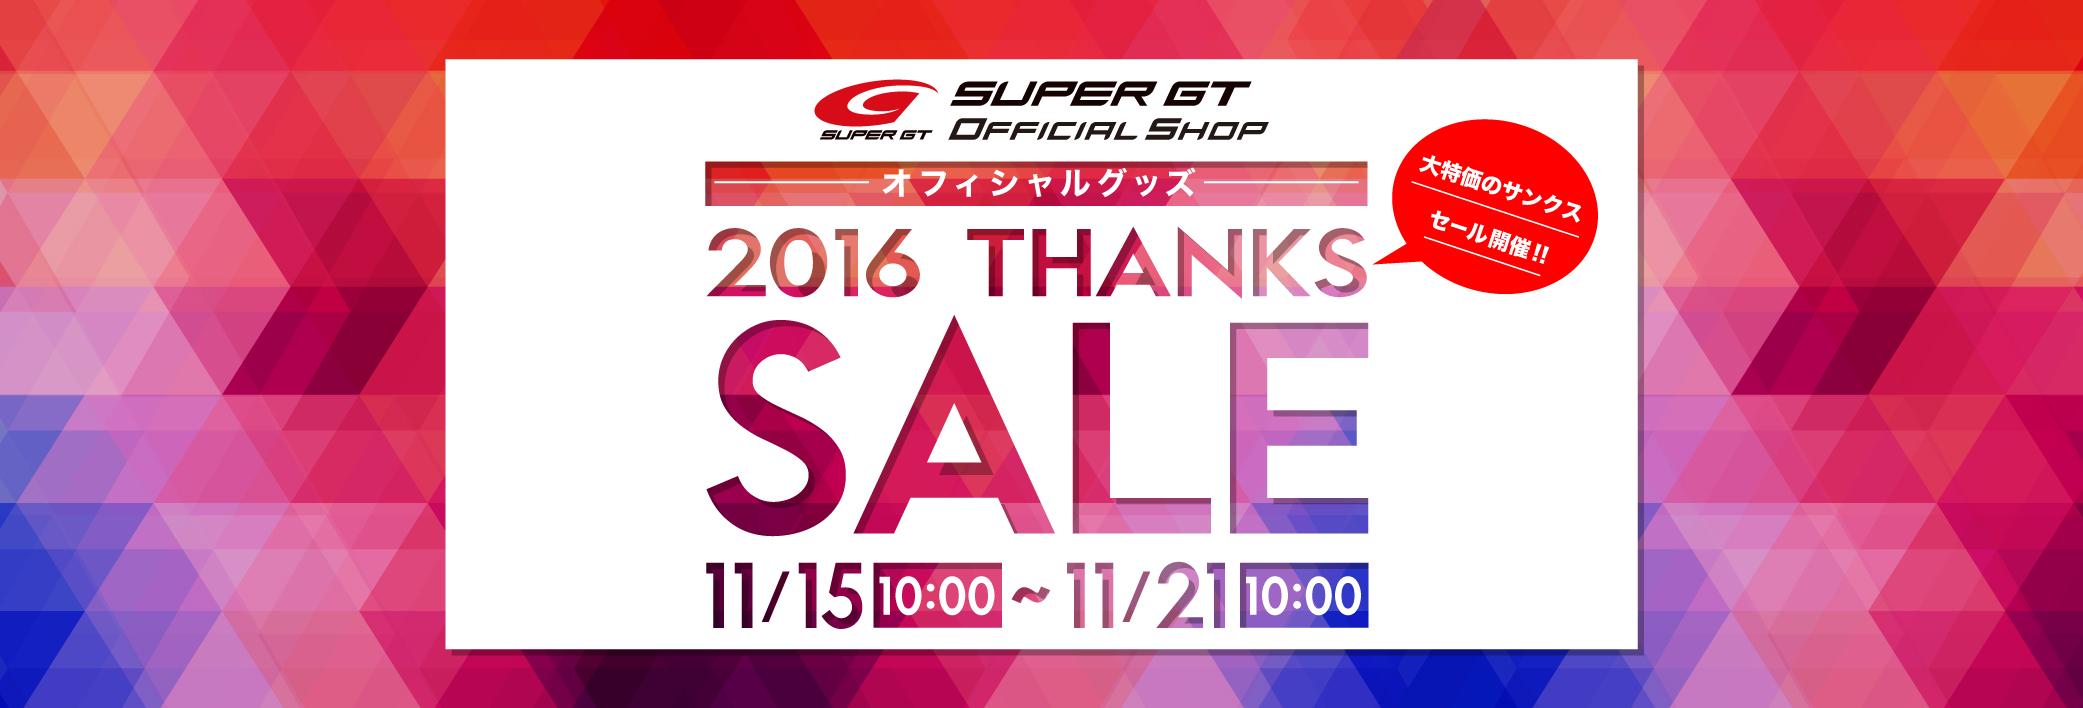 shop_SALE_bunner-01